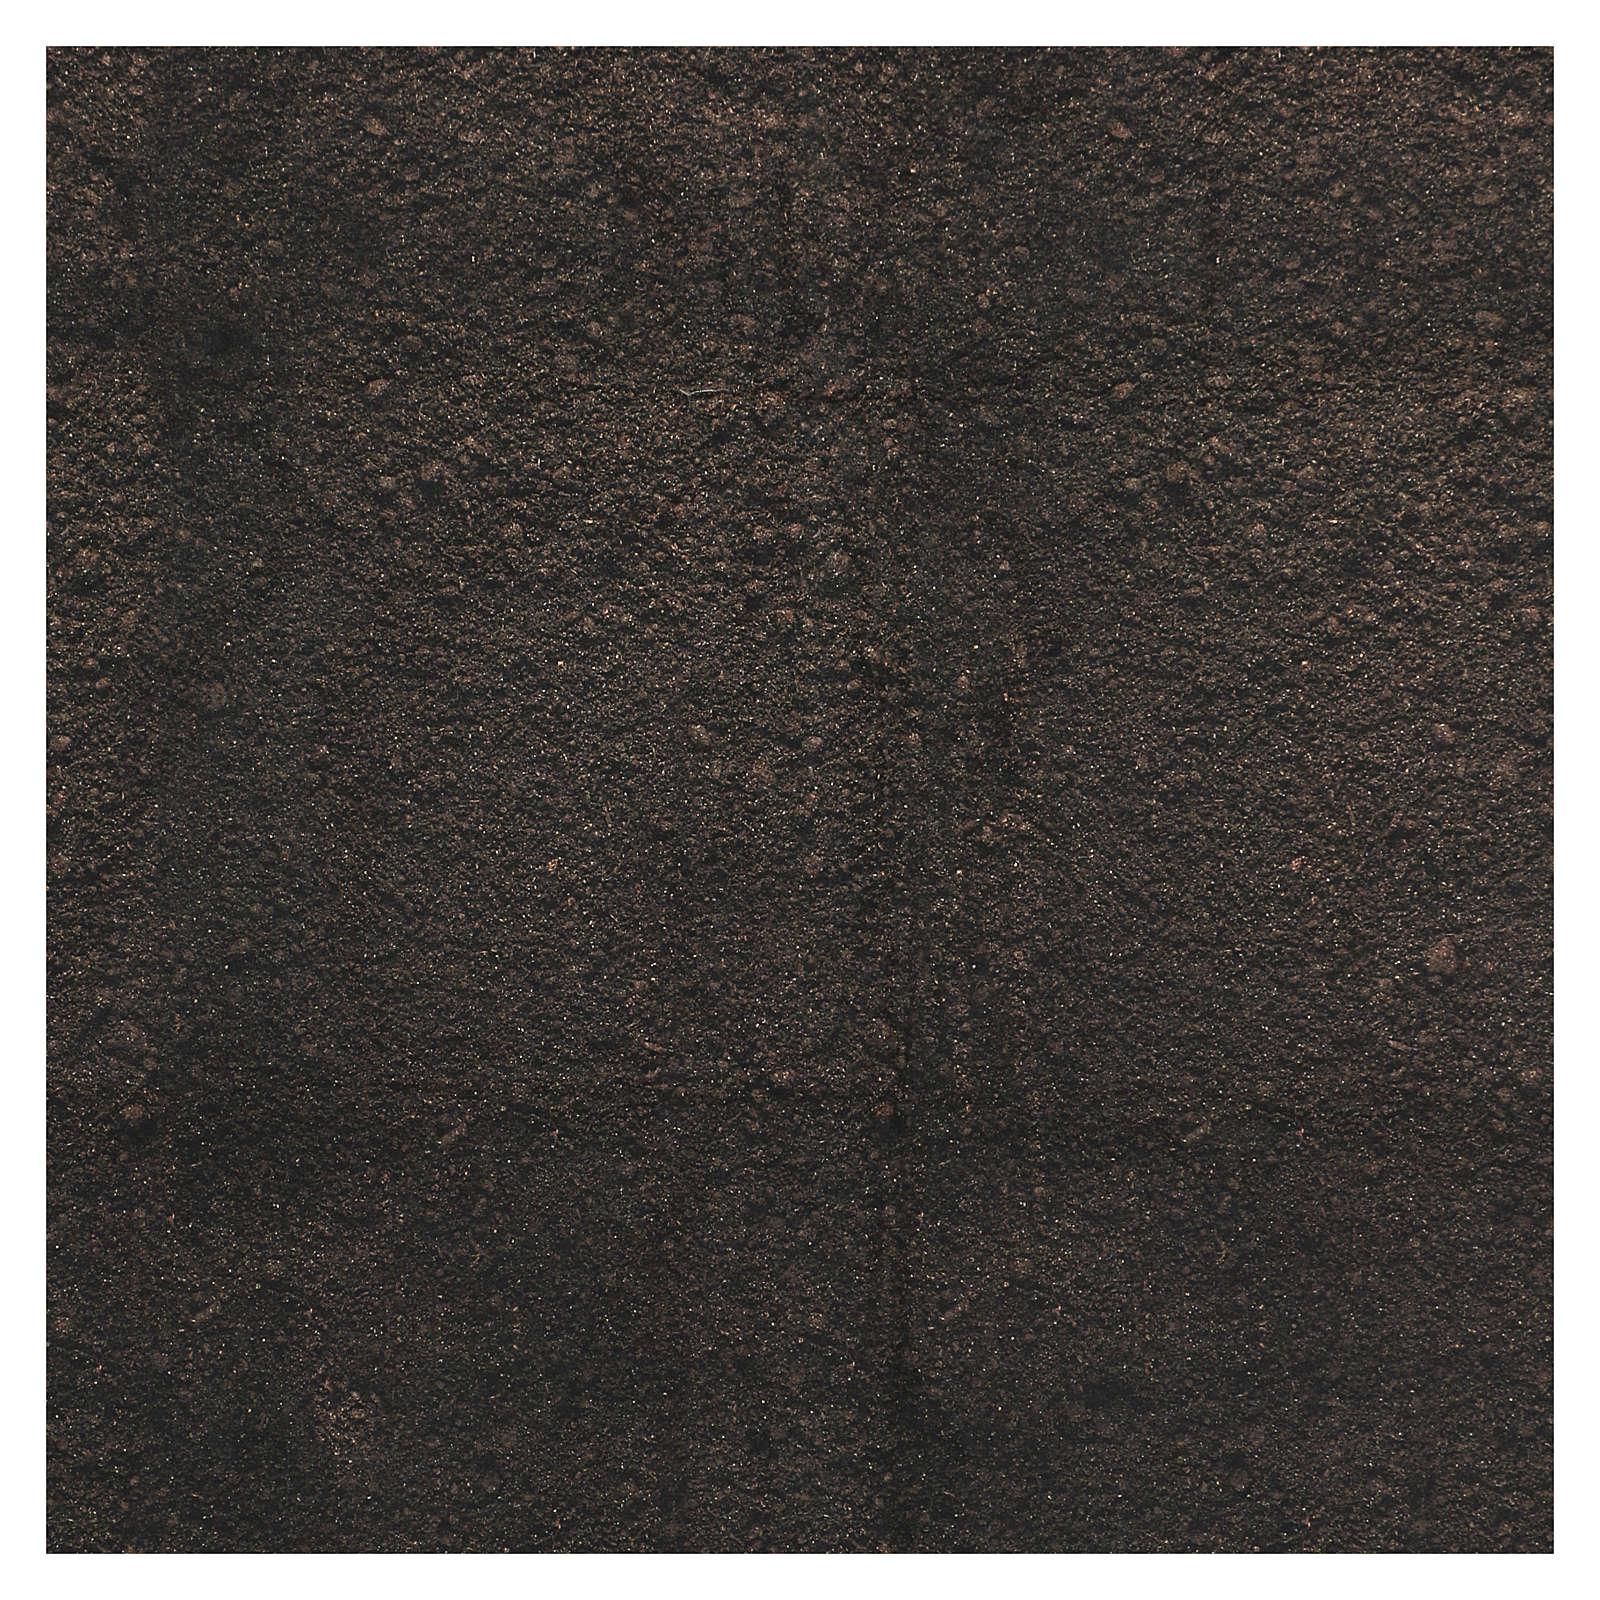 Papel modelable tierra oscura 60x60 cm para belenes 4